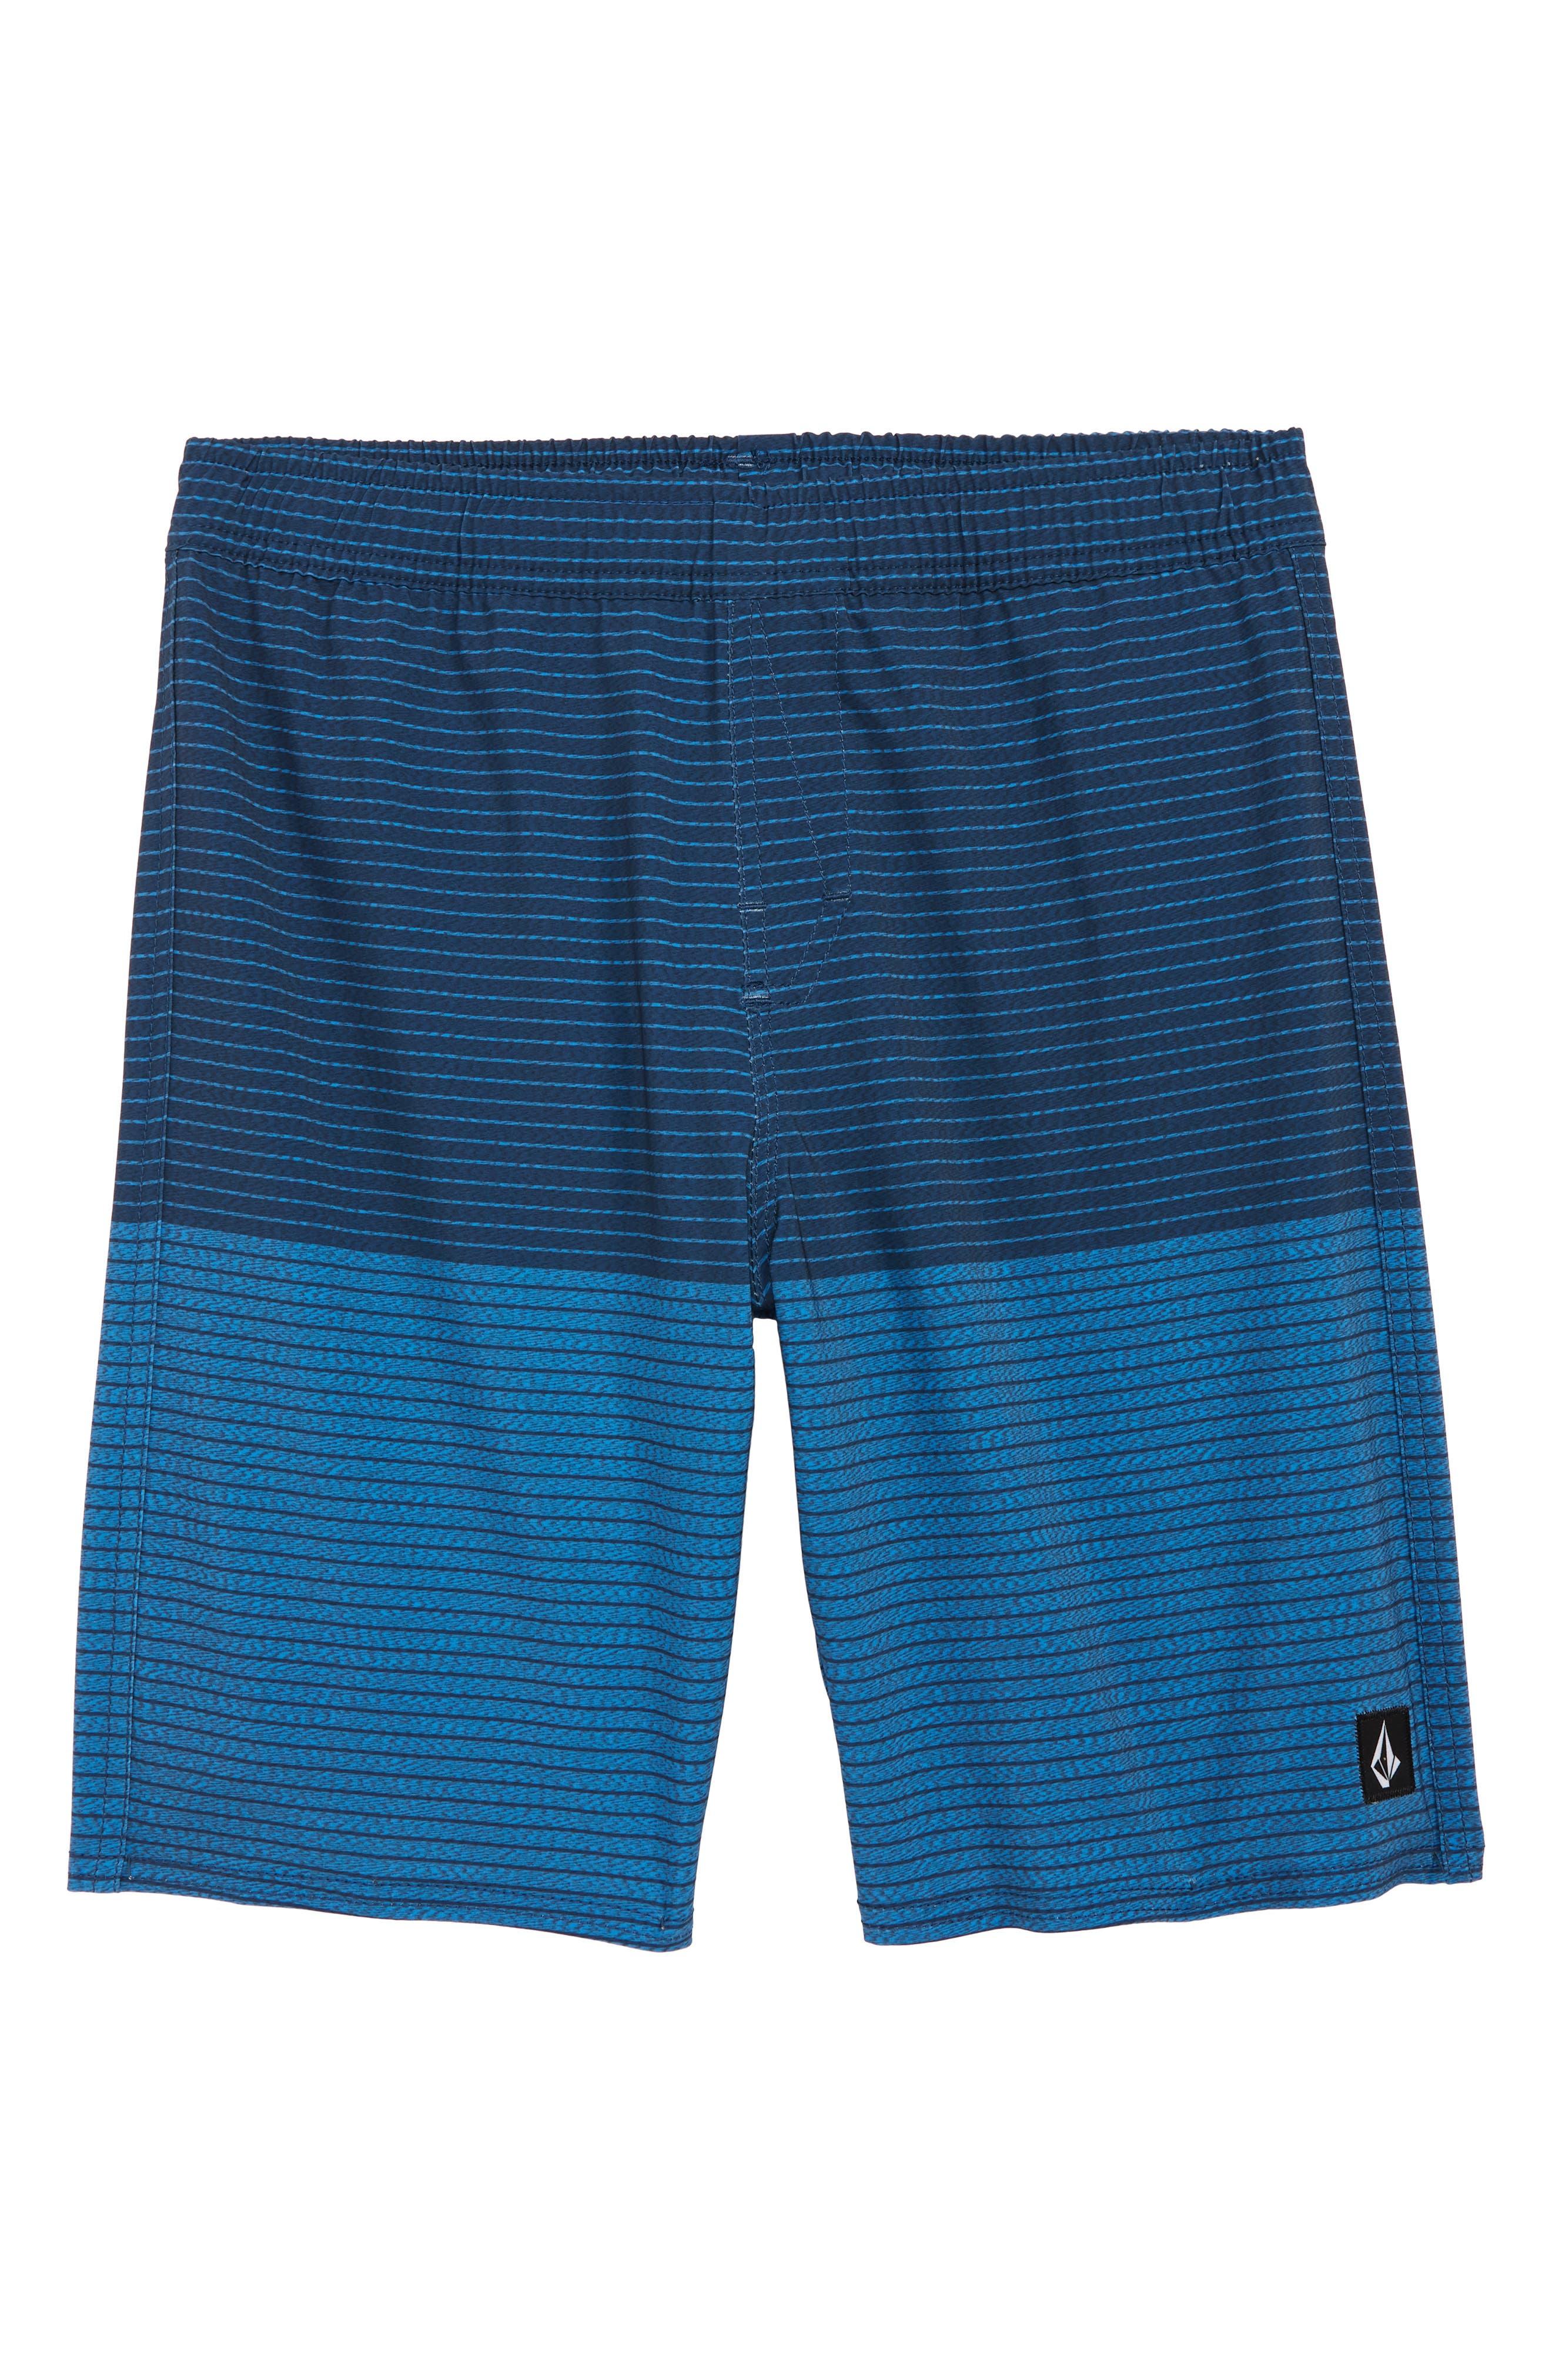 b1cac3a364 Boy's Volcom Lido Heather Volley Swim Trunks, Size S (8) - Blue